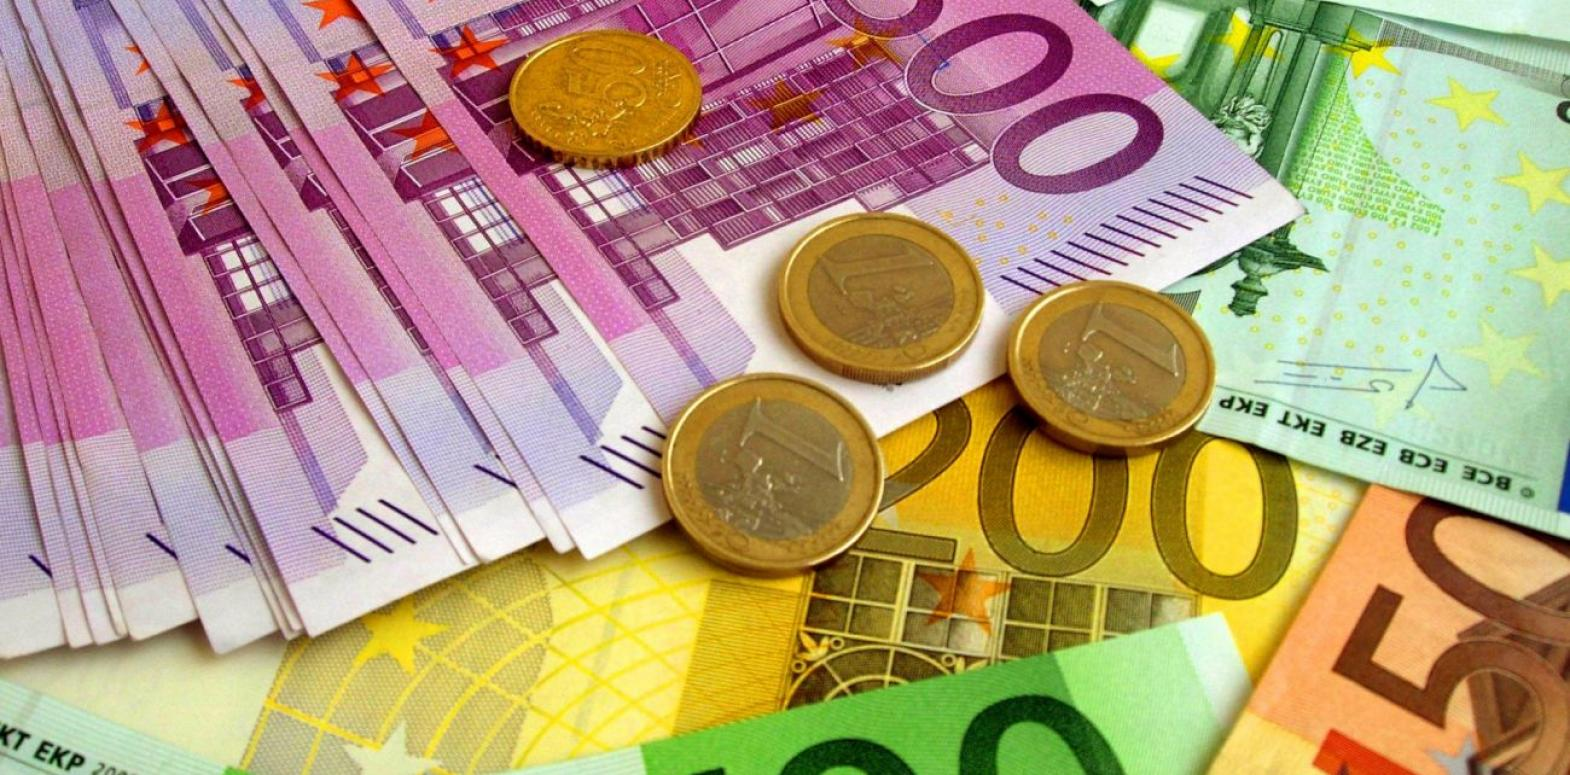 НБУ поднял курс евро выше 34 гривен